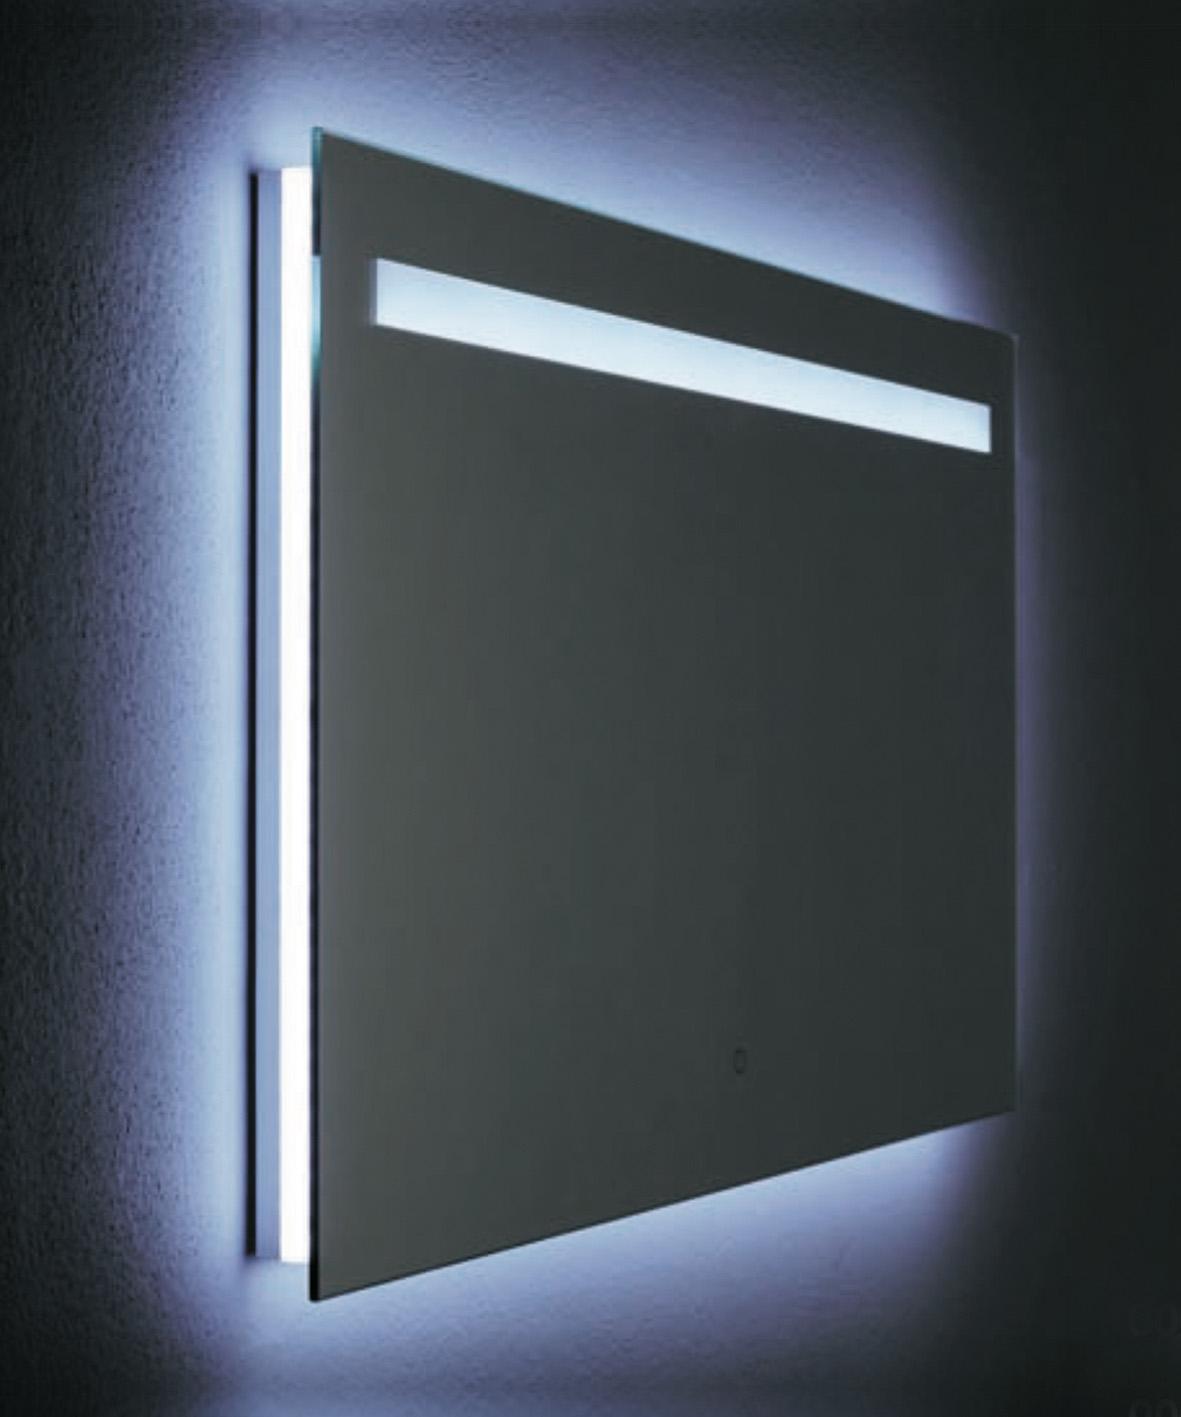 Kylpyhuoneen peili LED taustavalolla BALTECO DO - Interbauen ... 7dcee93bc5